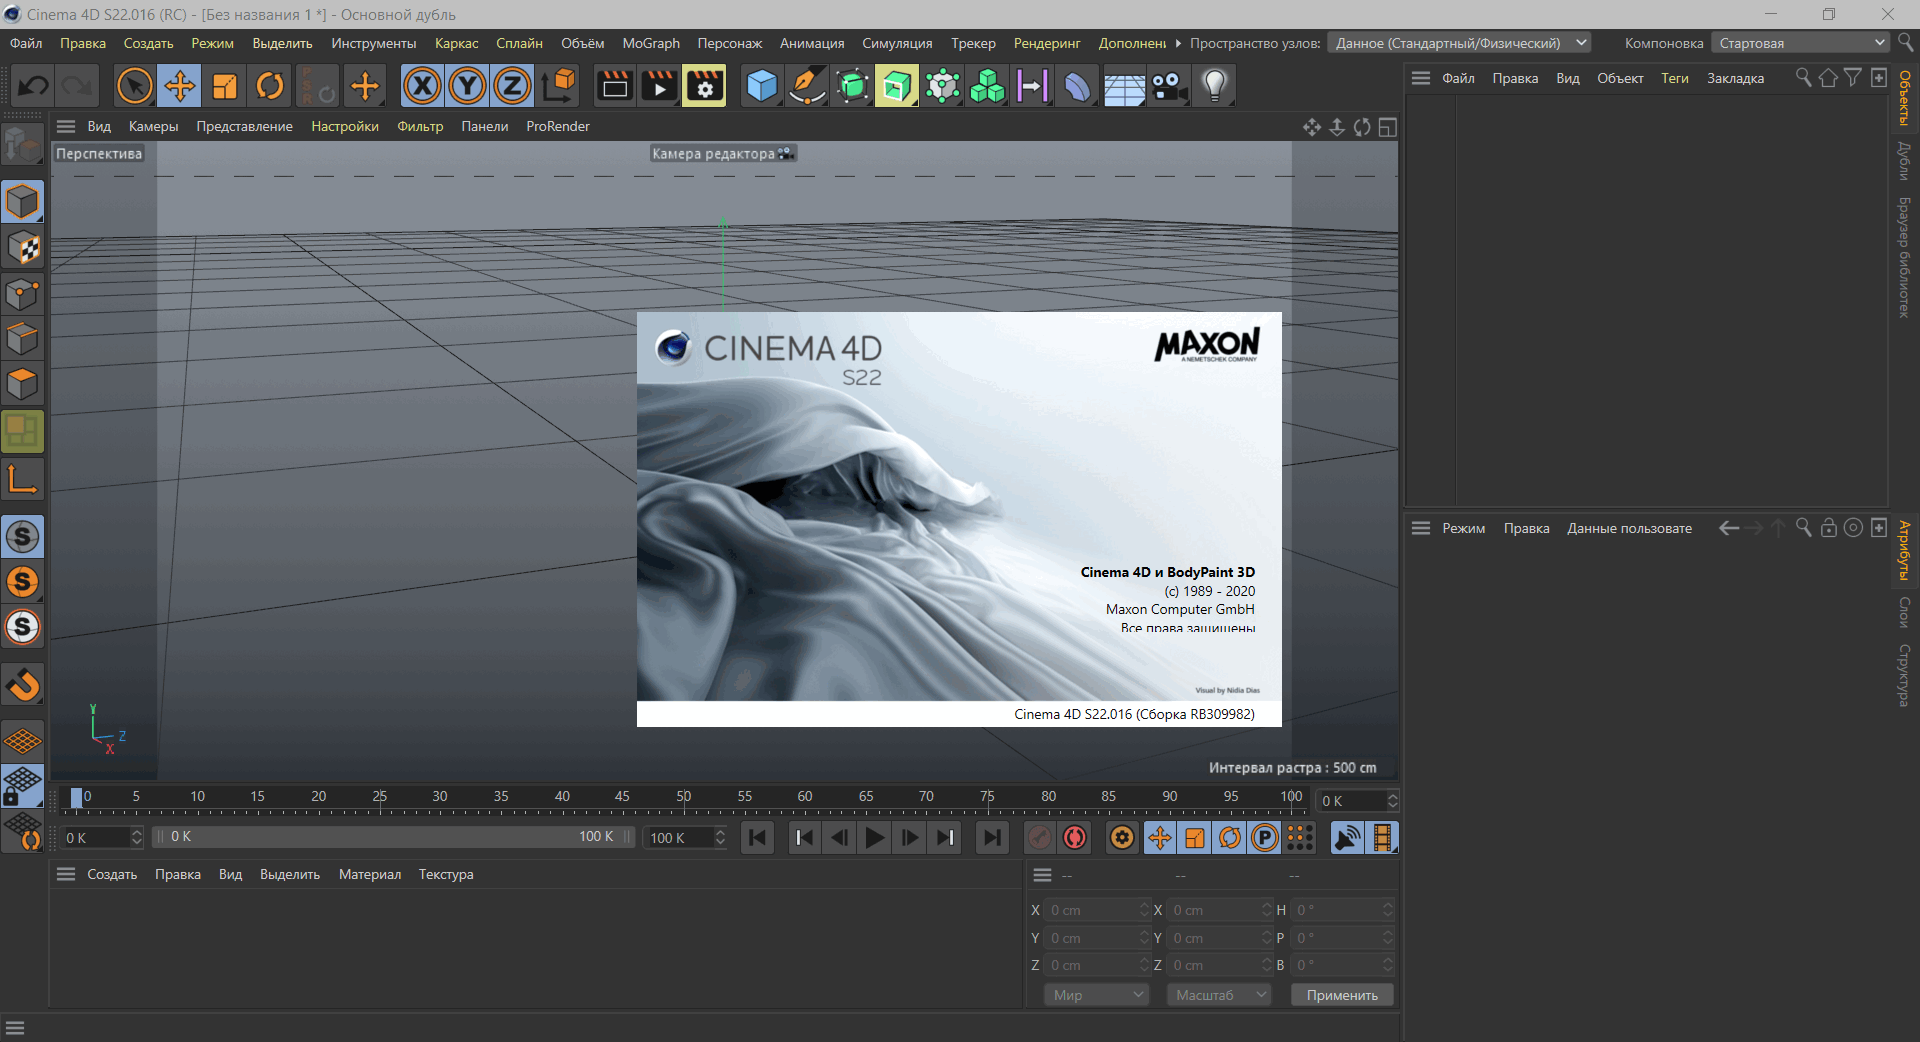 Maxon CINEMA 4D Studio S22.016 build RB309982 (2020) PC